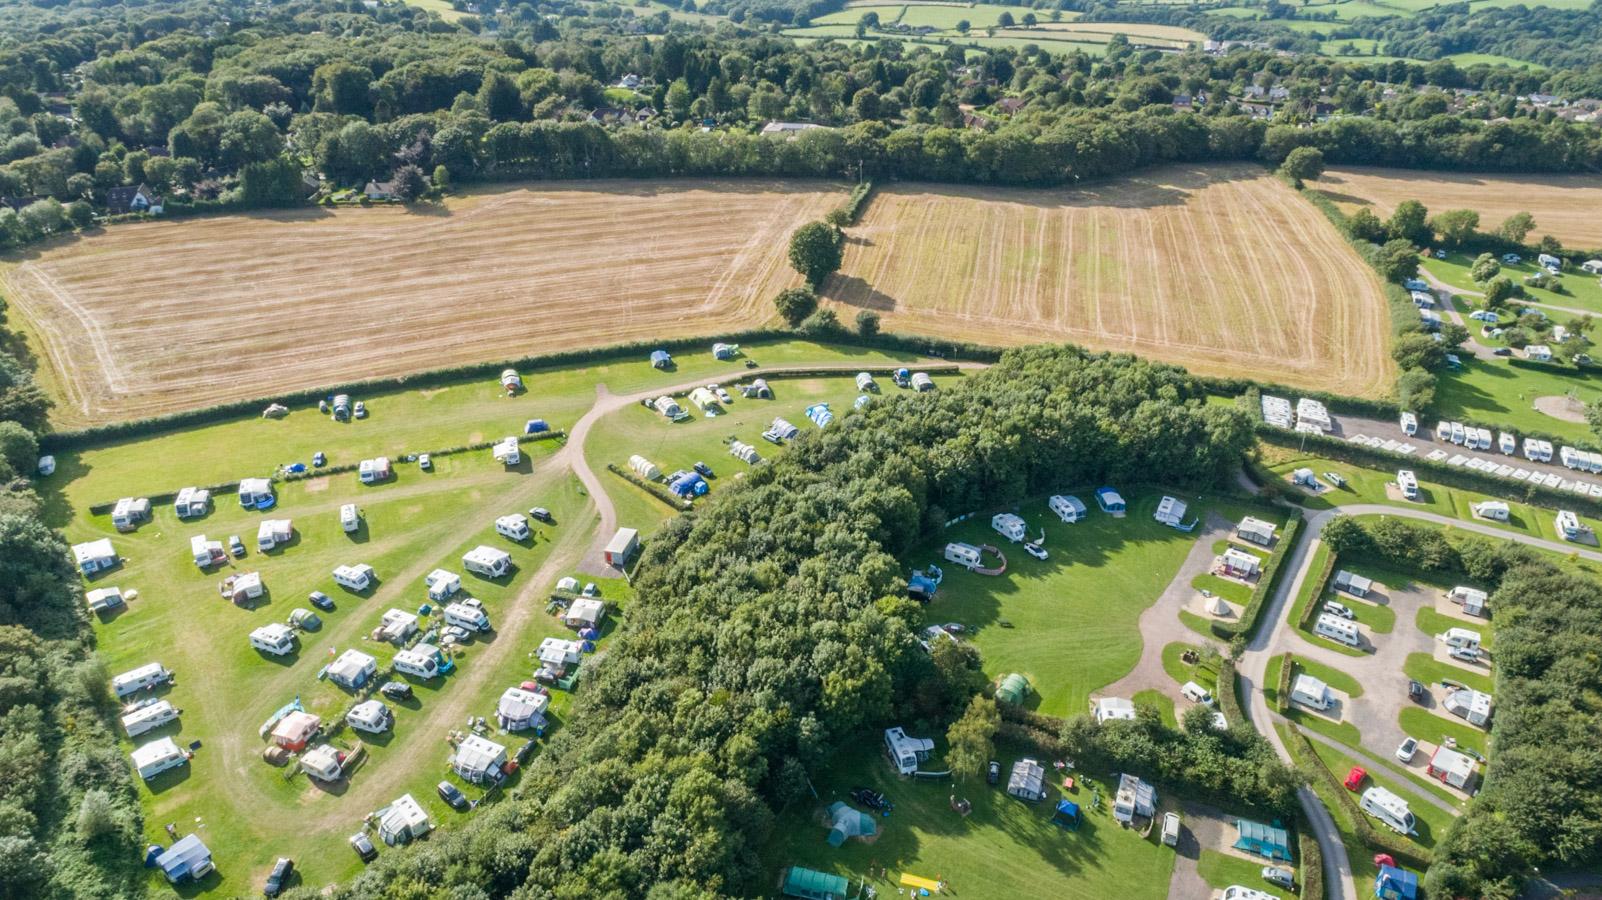 Neil-Bigwood-Monkton-Wyld-Camping-07